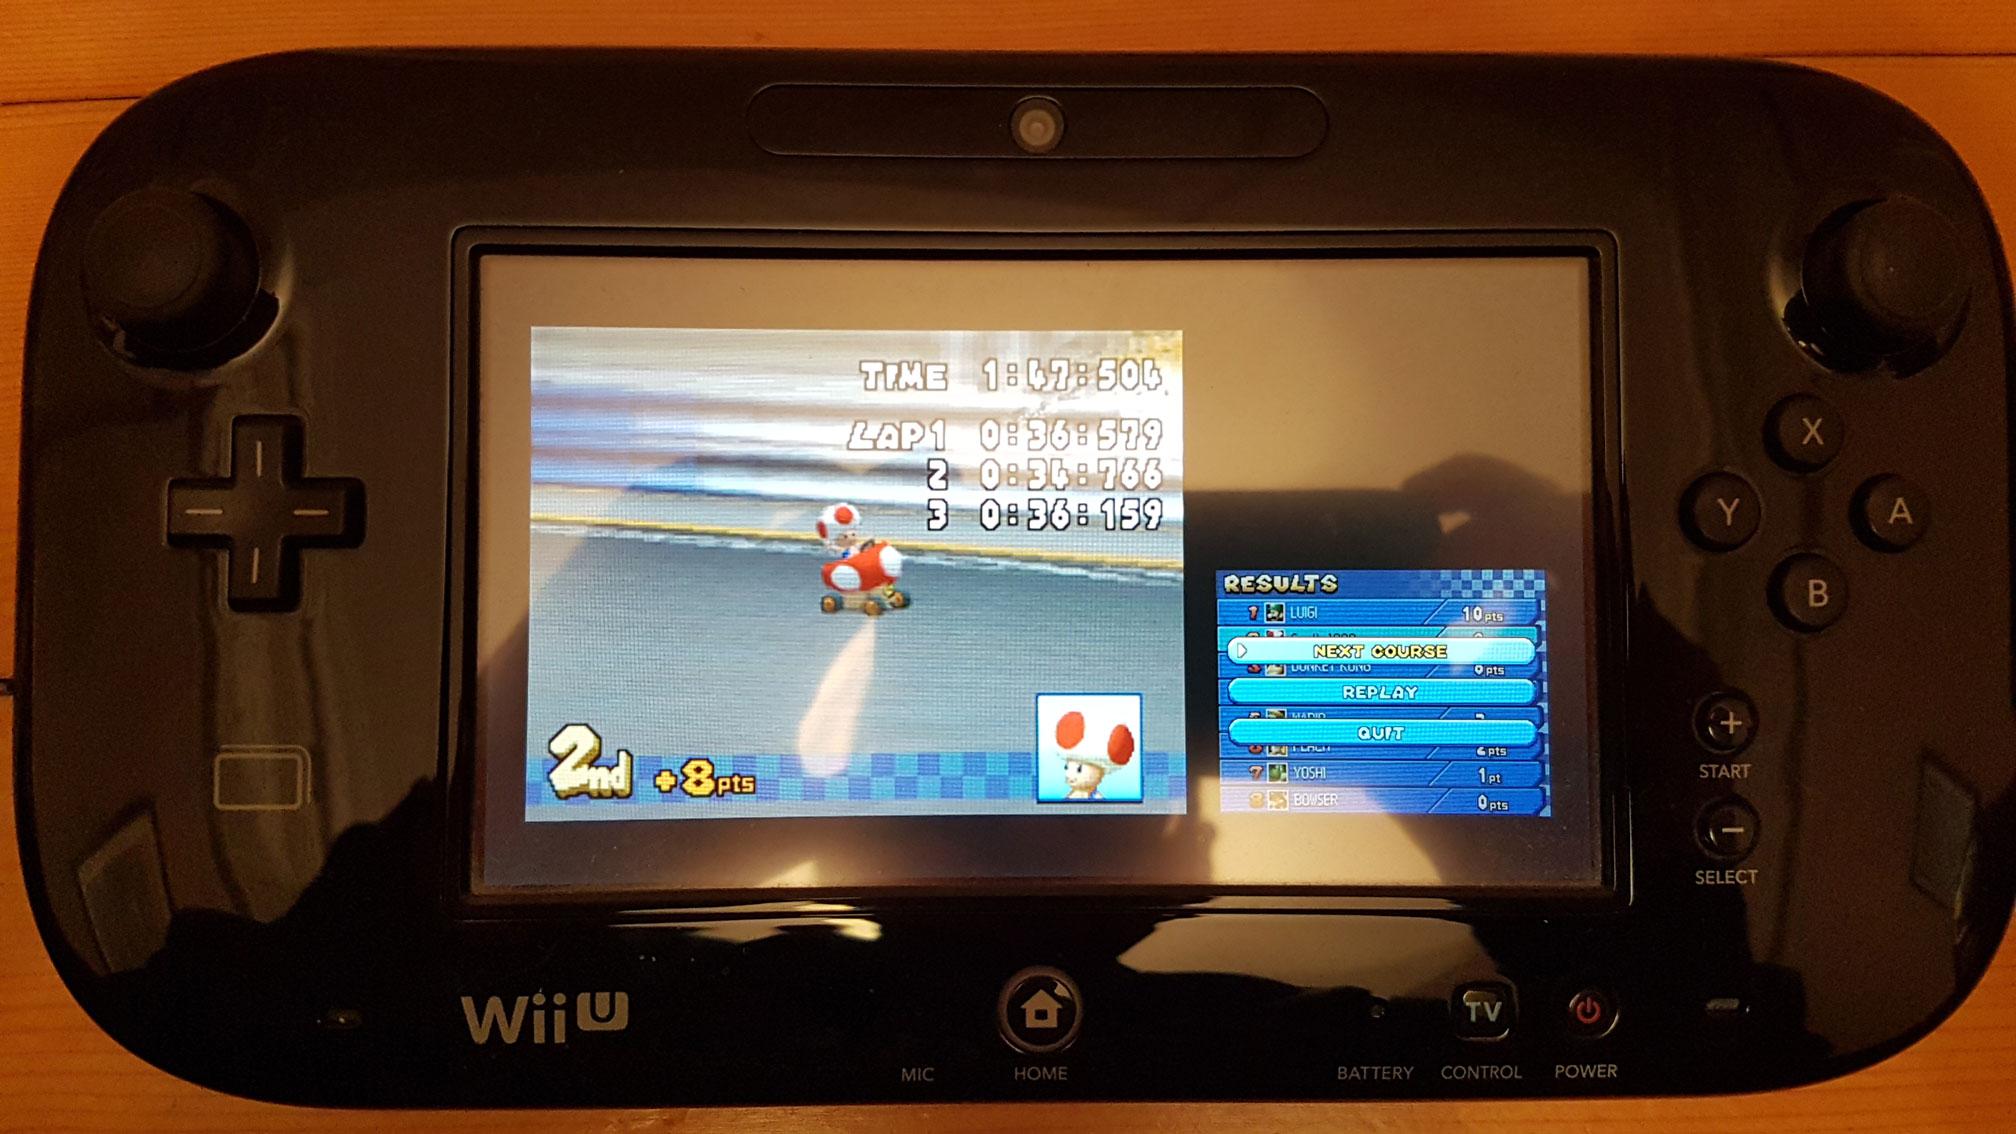 Wii U Nintendo Ds : Nintendo switch wishlist features i hope it… um